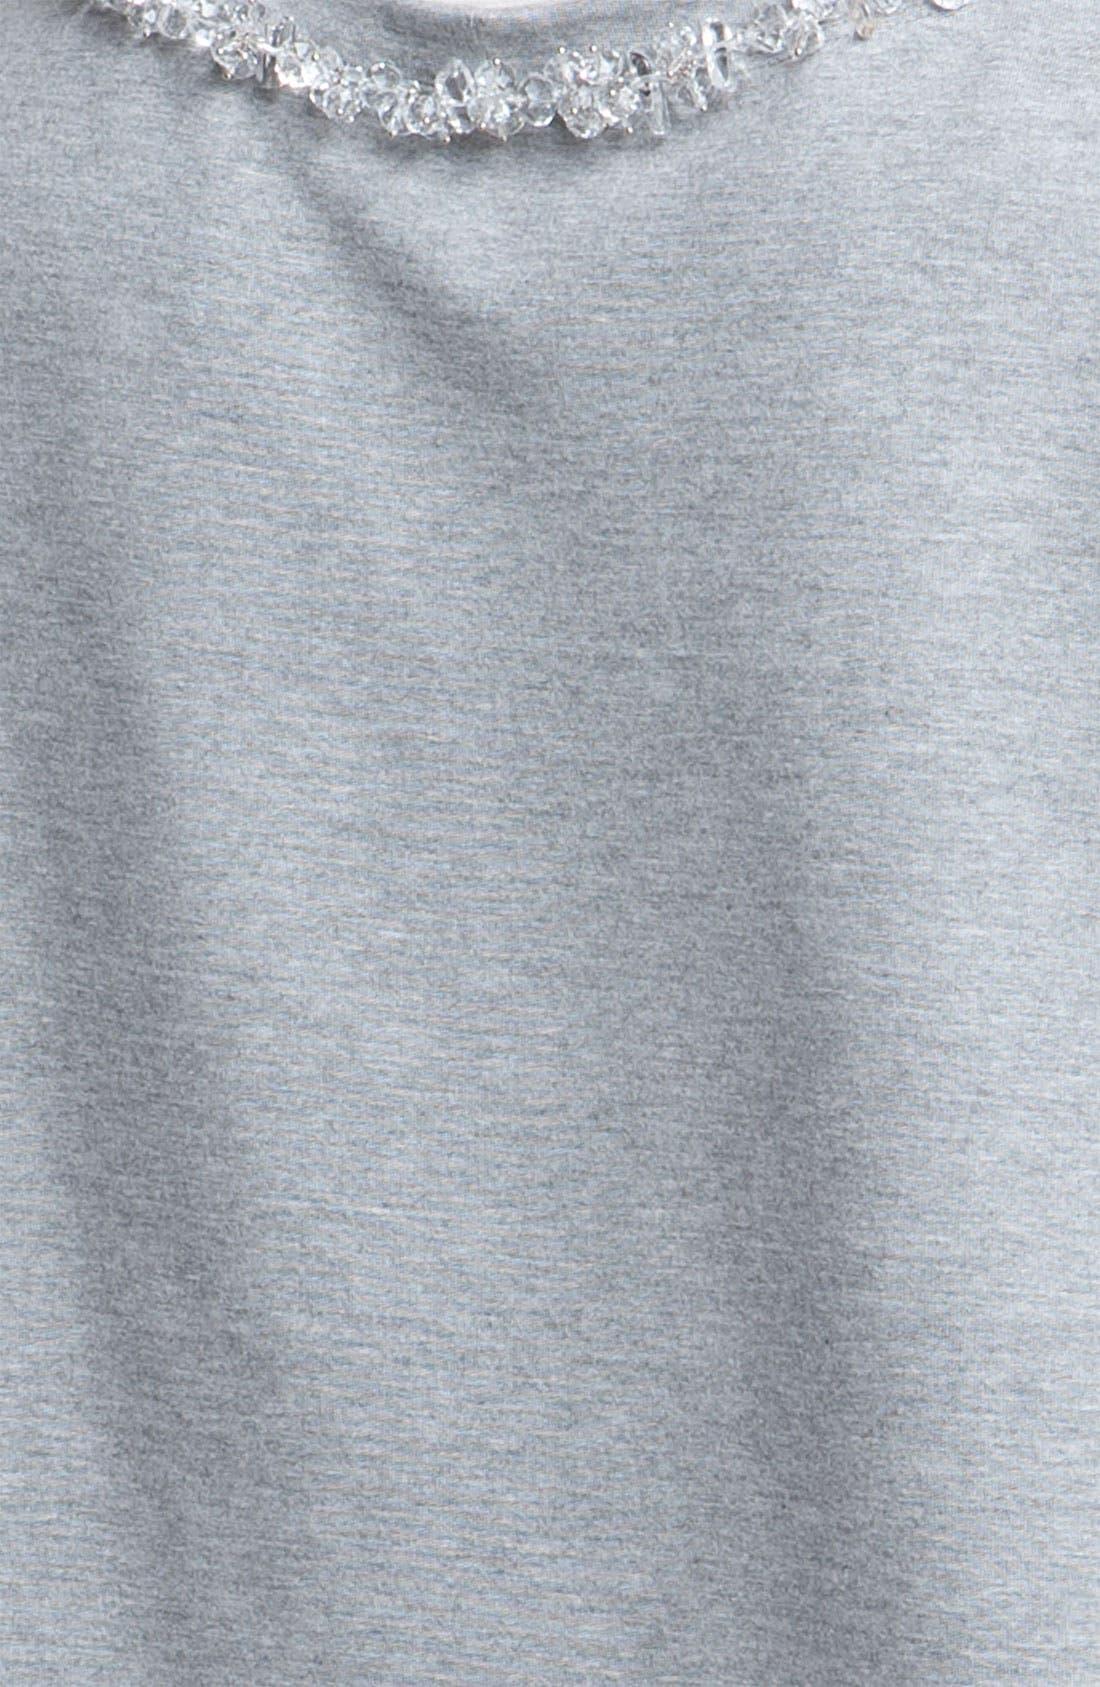 Alternate Image 3  - Robert Rodriguez Embellished Neck Double Layer Top